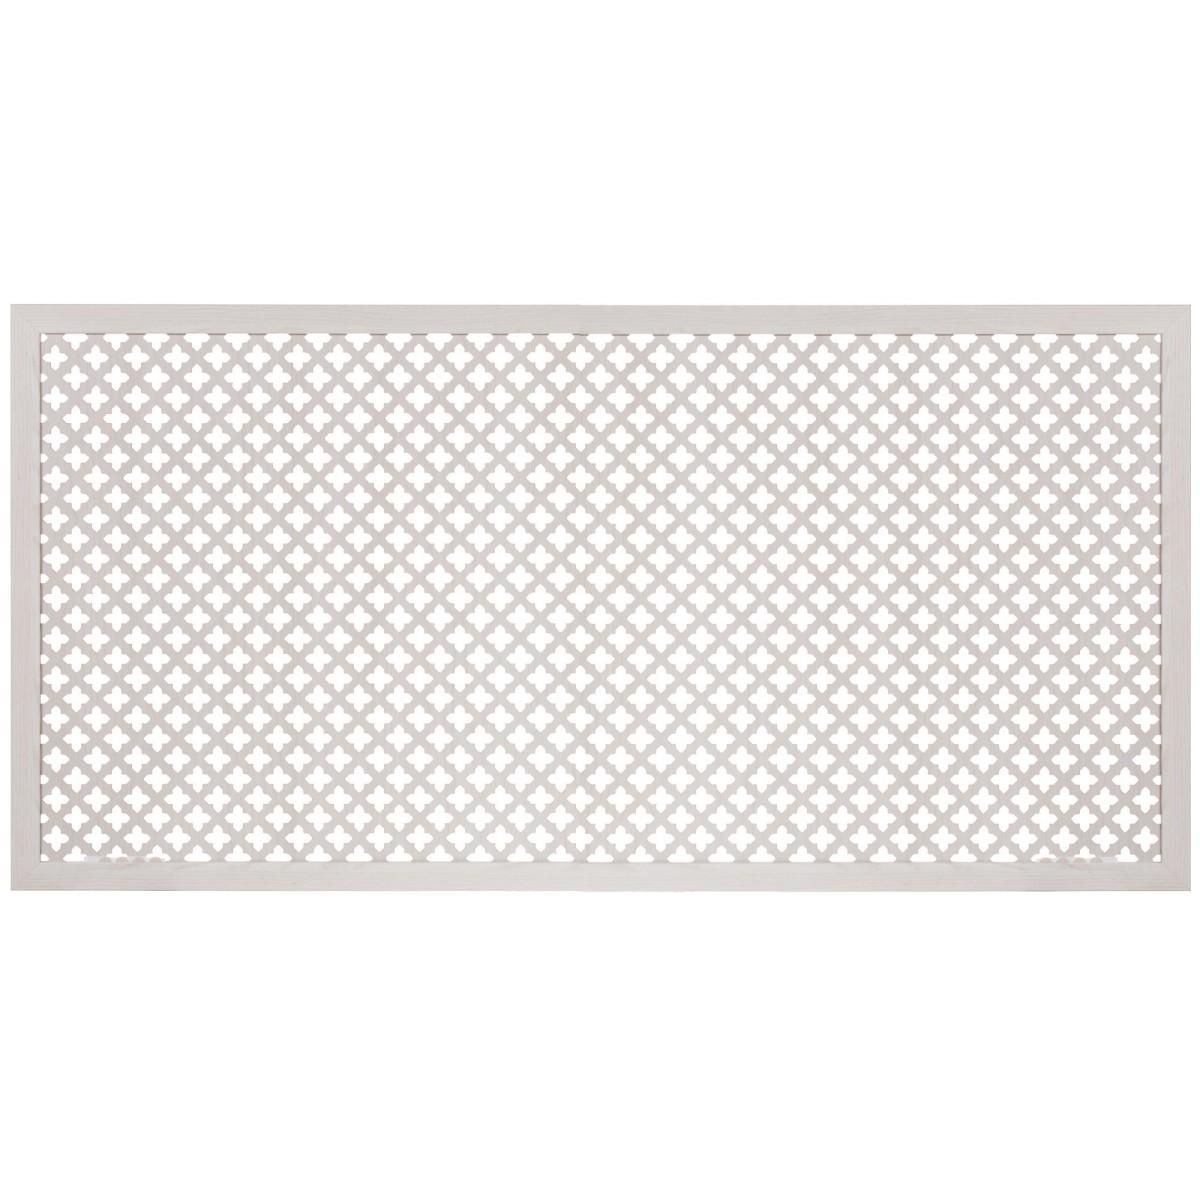 Экран для радиатора Лотос 60х120 см цвет клён